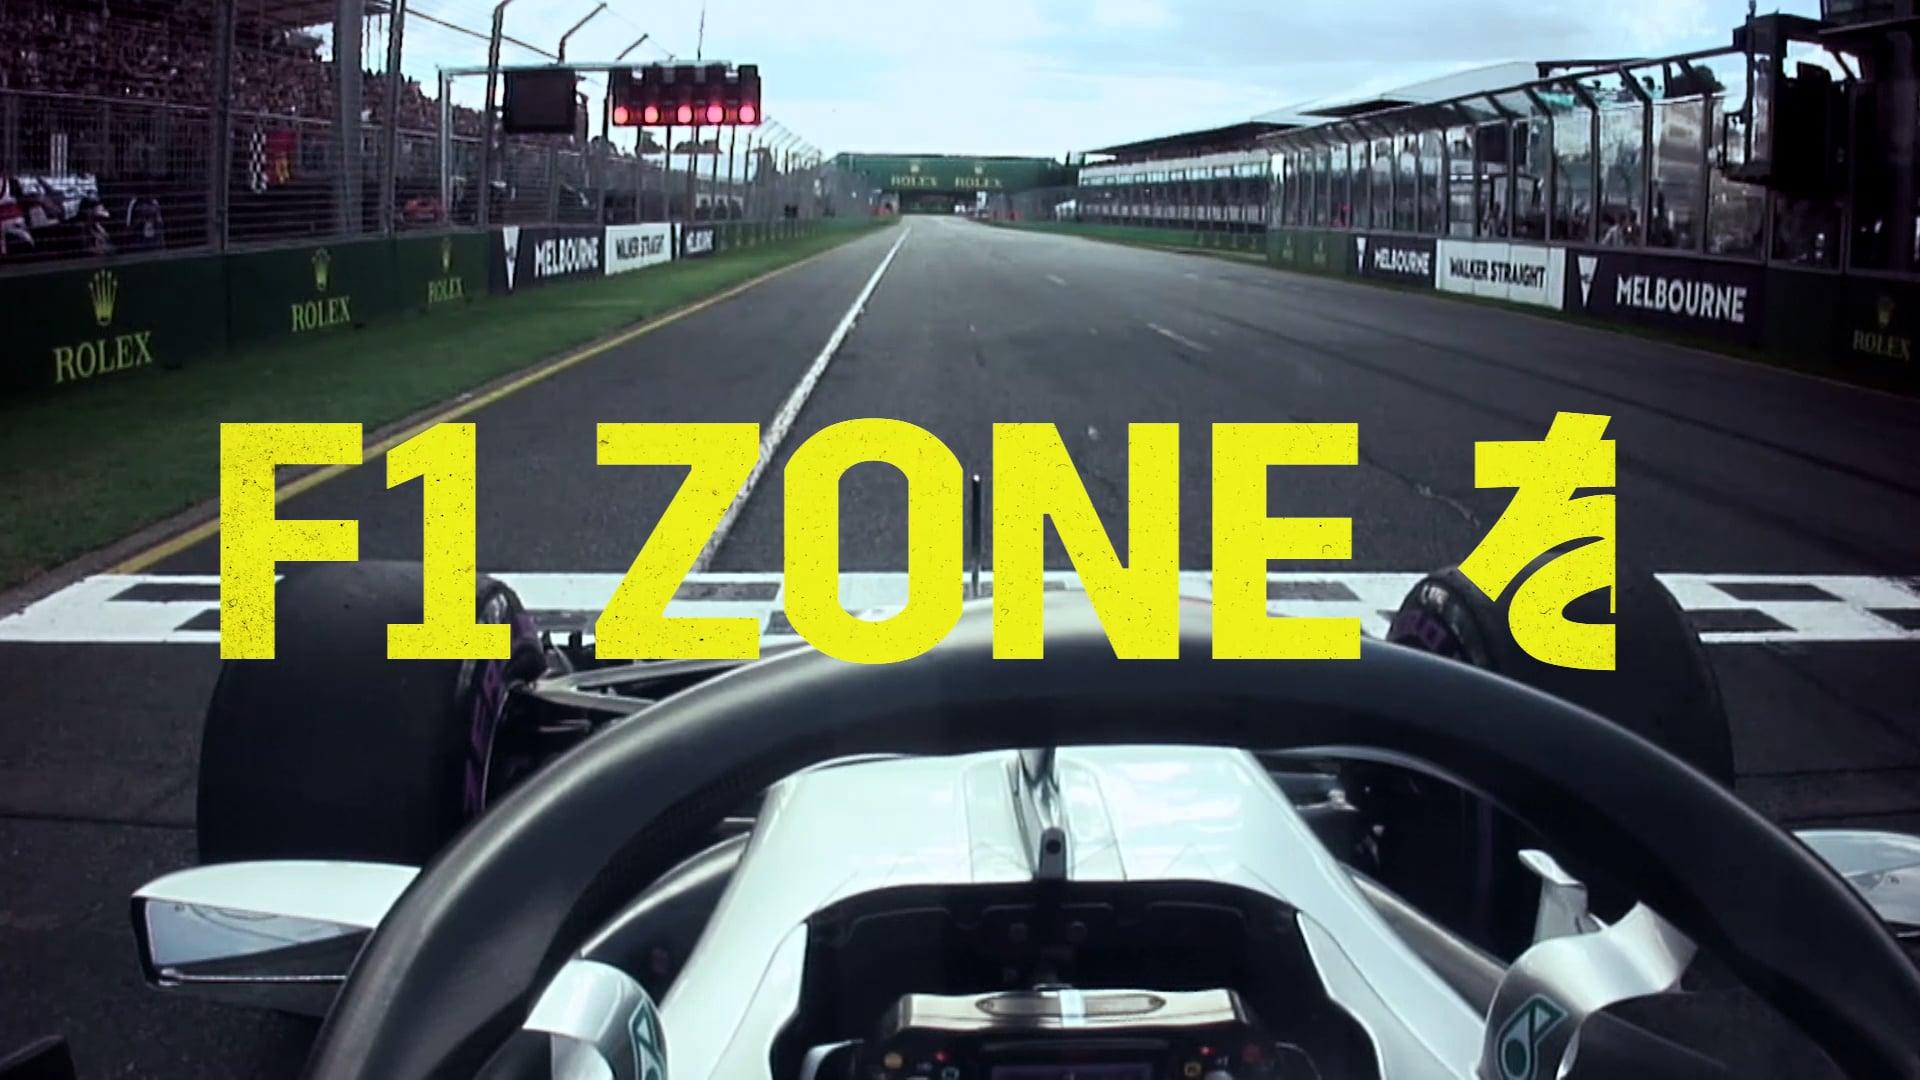 F1 Zone